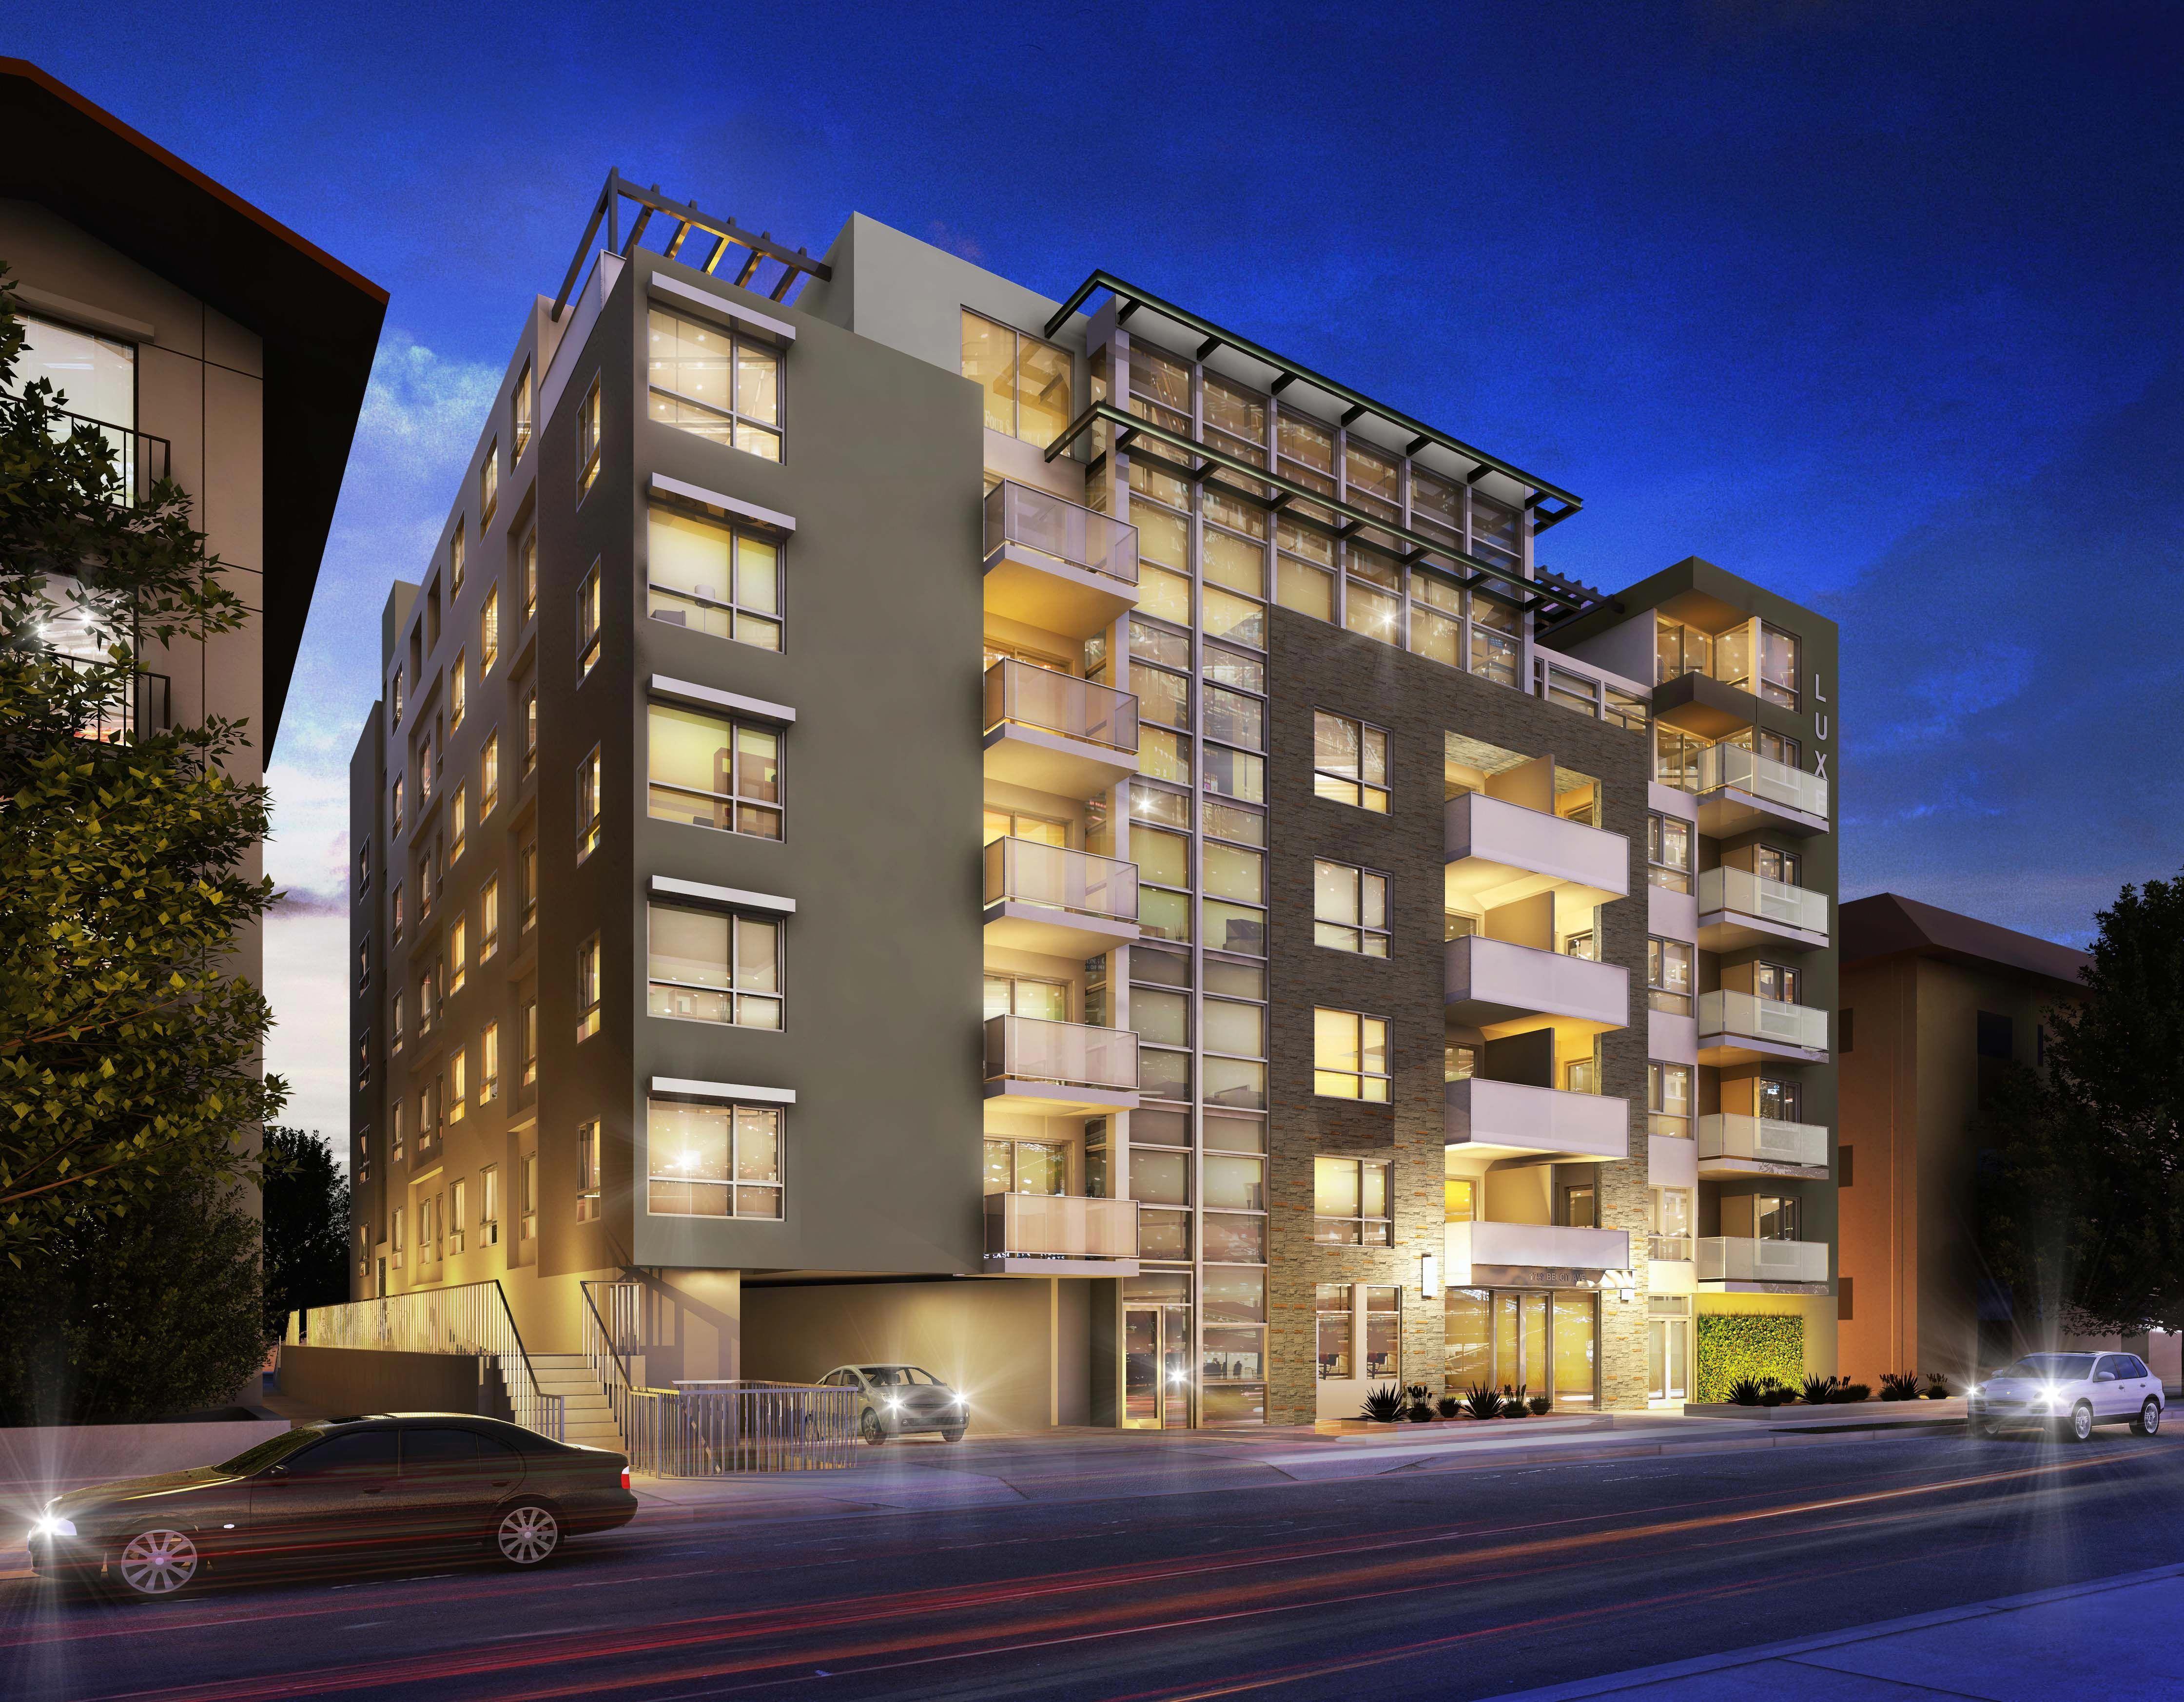 West Los Angeles Apartment Architecture Apartments Losangeles Exteriordesignap Residential Architecture Apartment Los Angeles Apartments Apartment Building